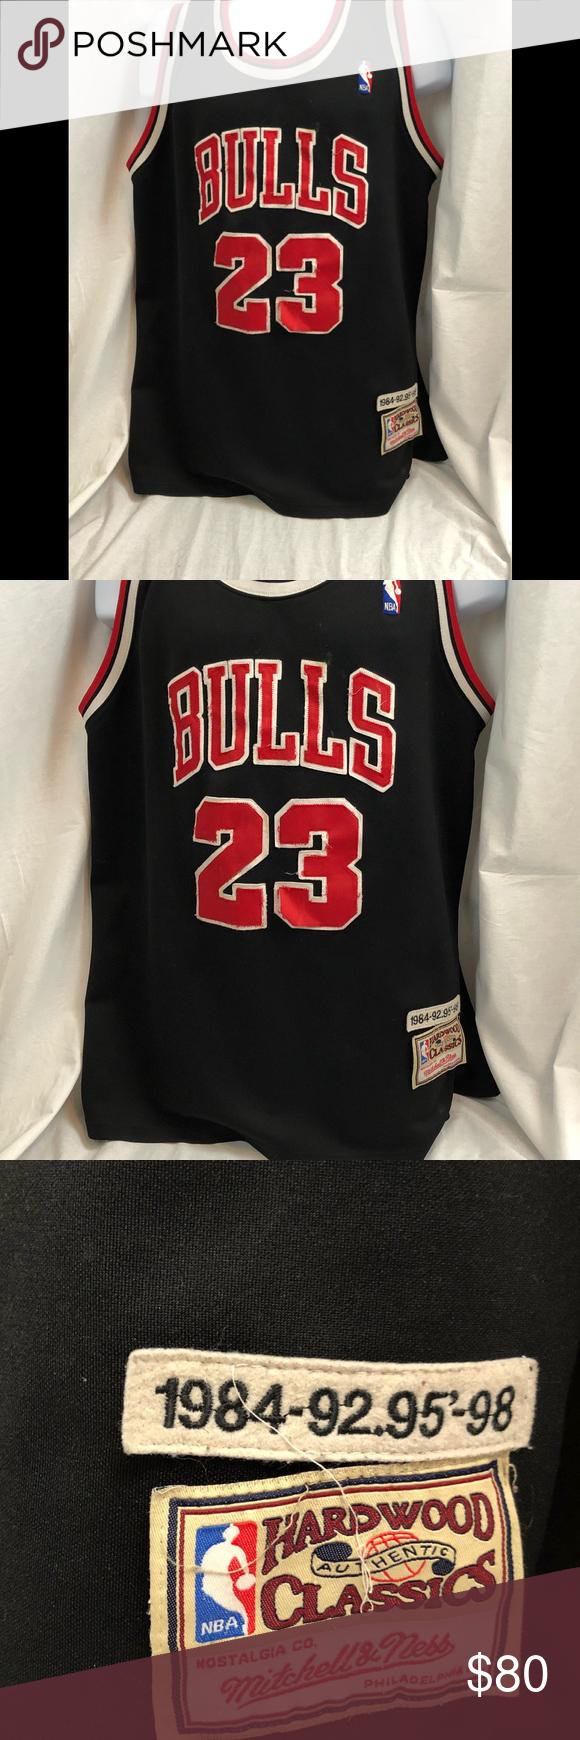 best service c6b36 5fbd9 VTG Mitchell & Ness Chicago Bulls Michael Jordan VTG ...